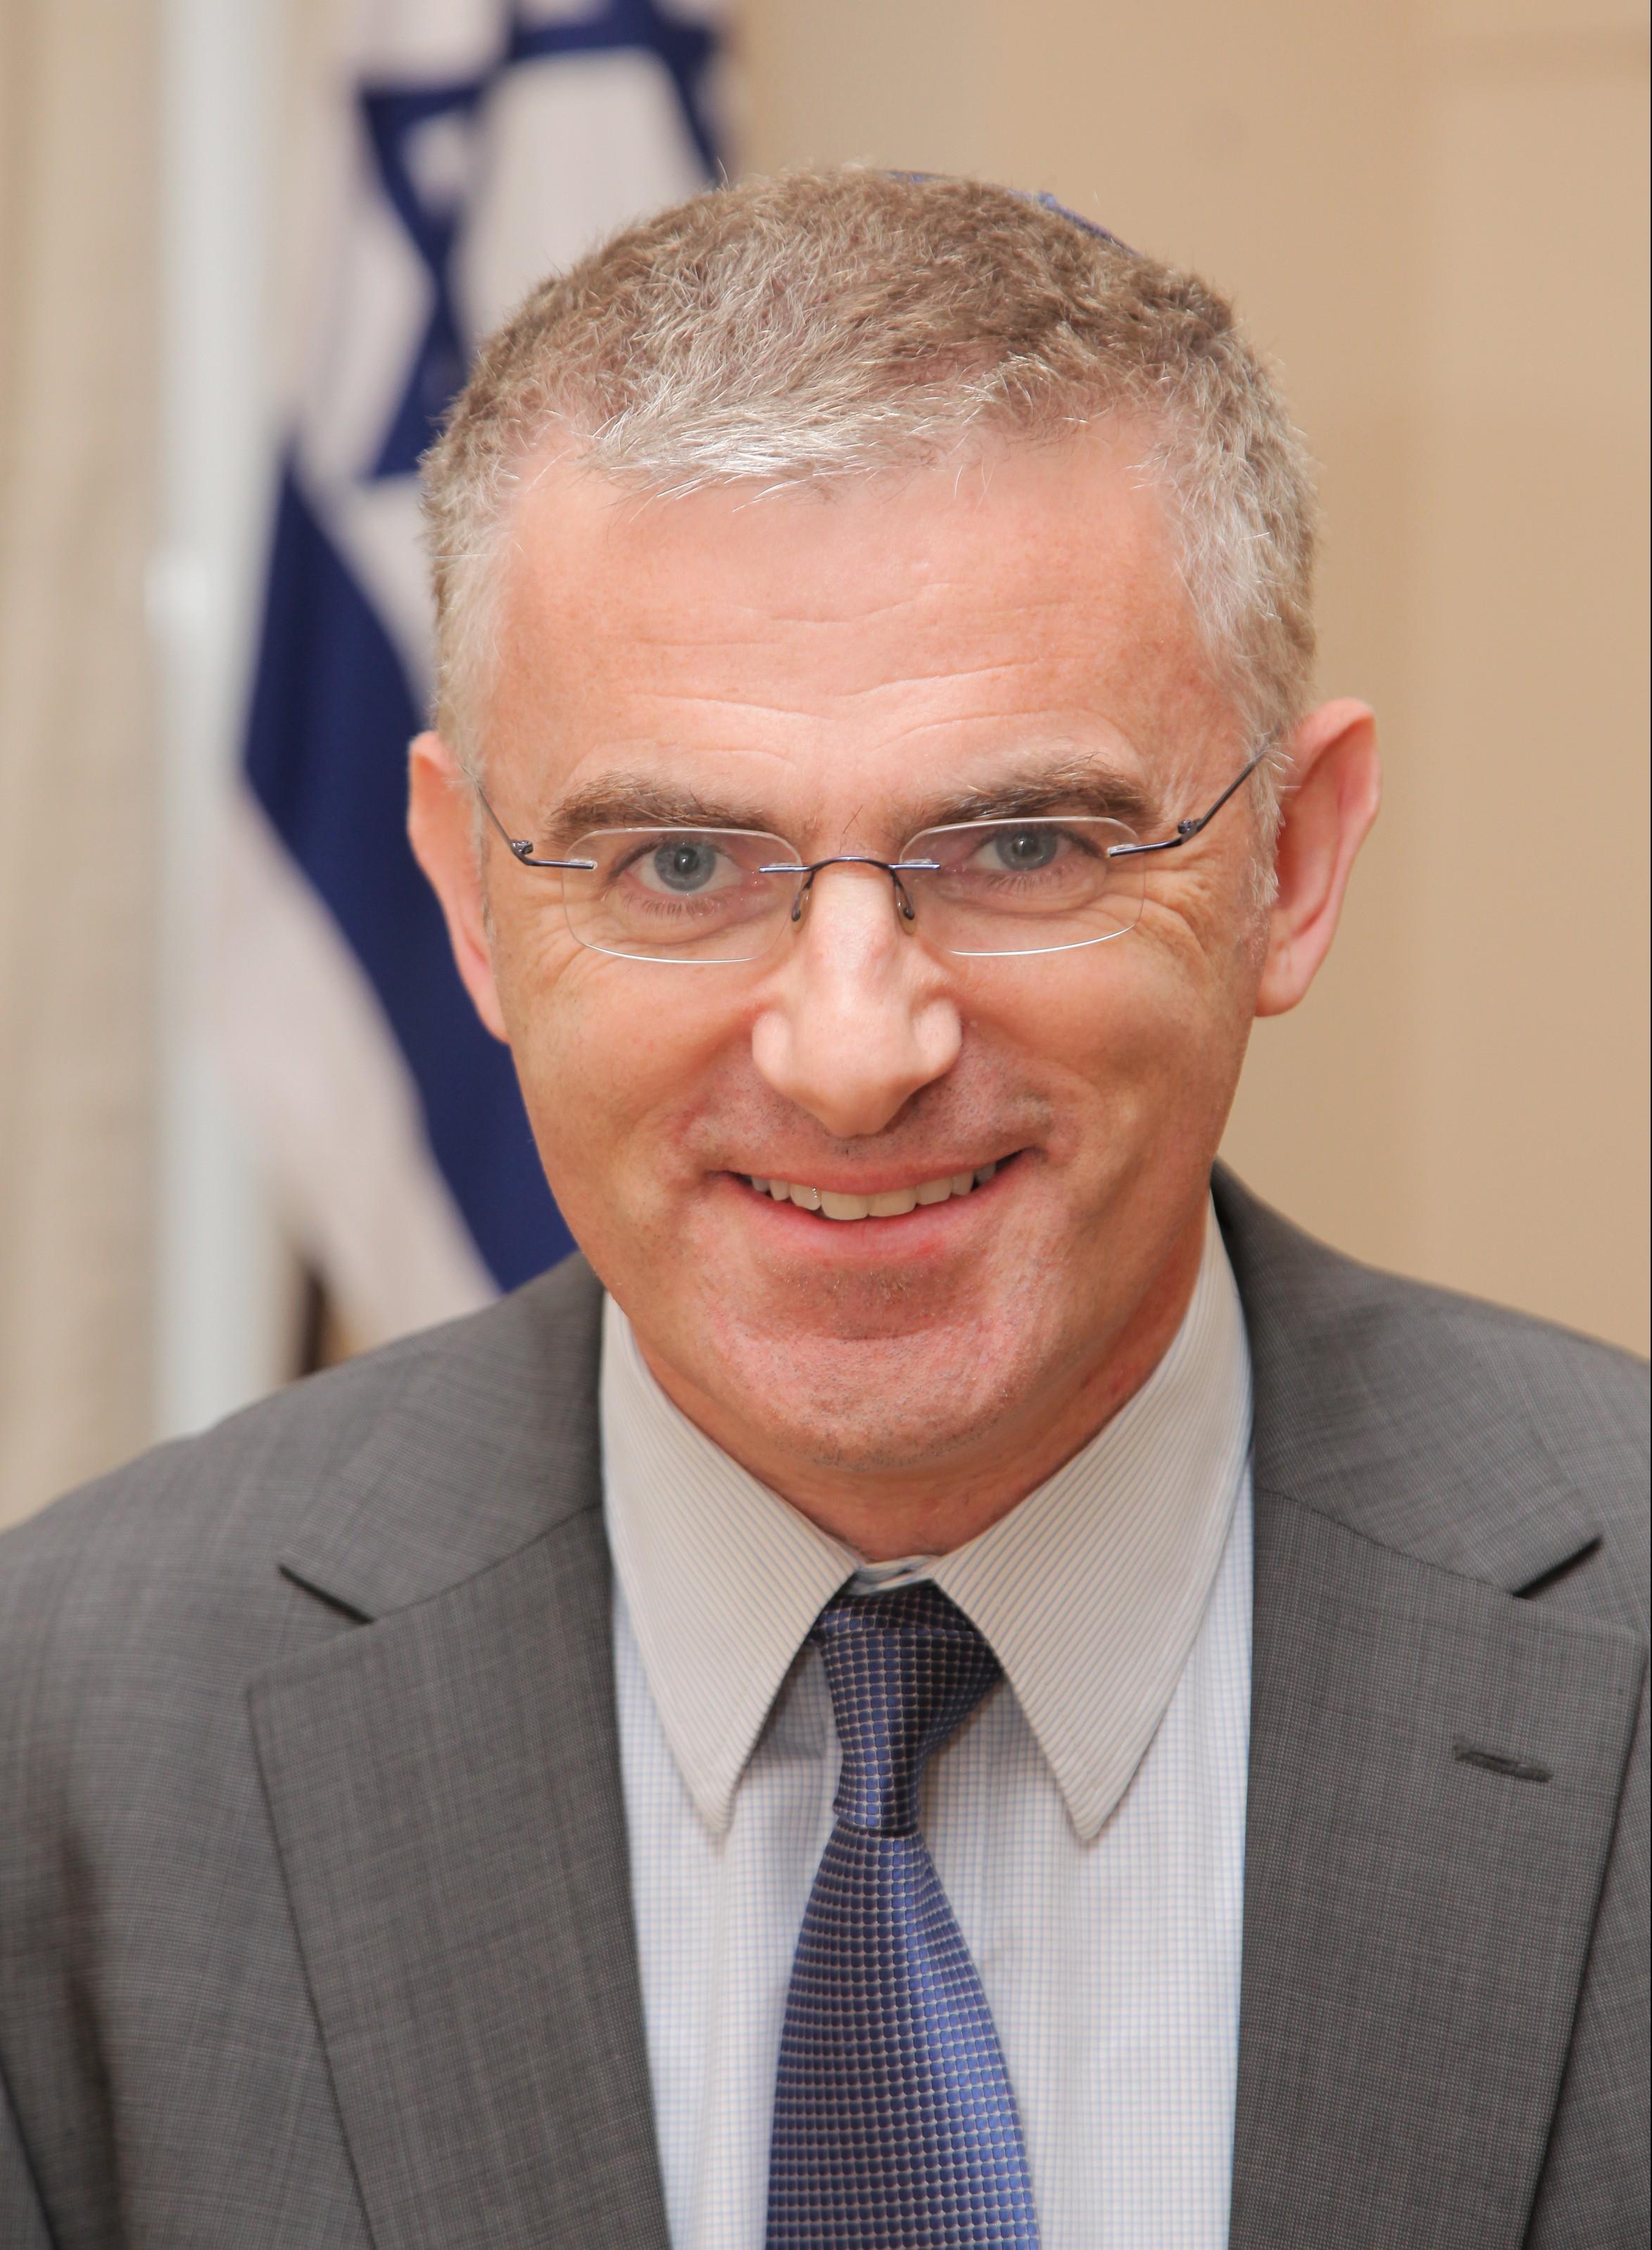 Daniel Taub, former Israeli Ambassador to the UK